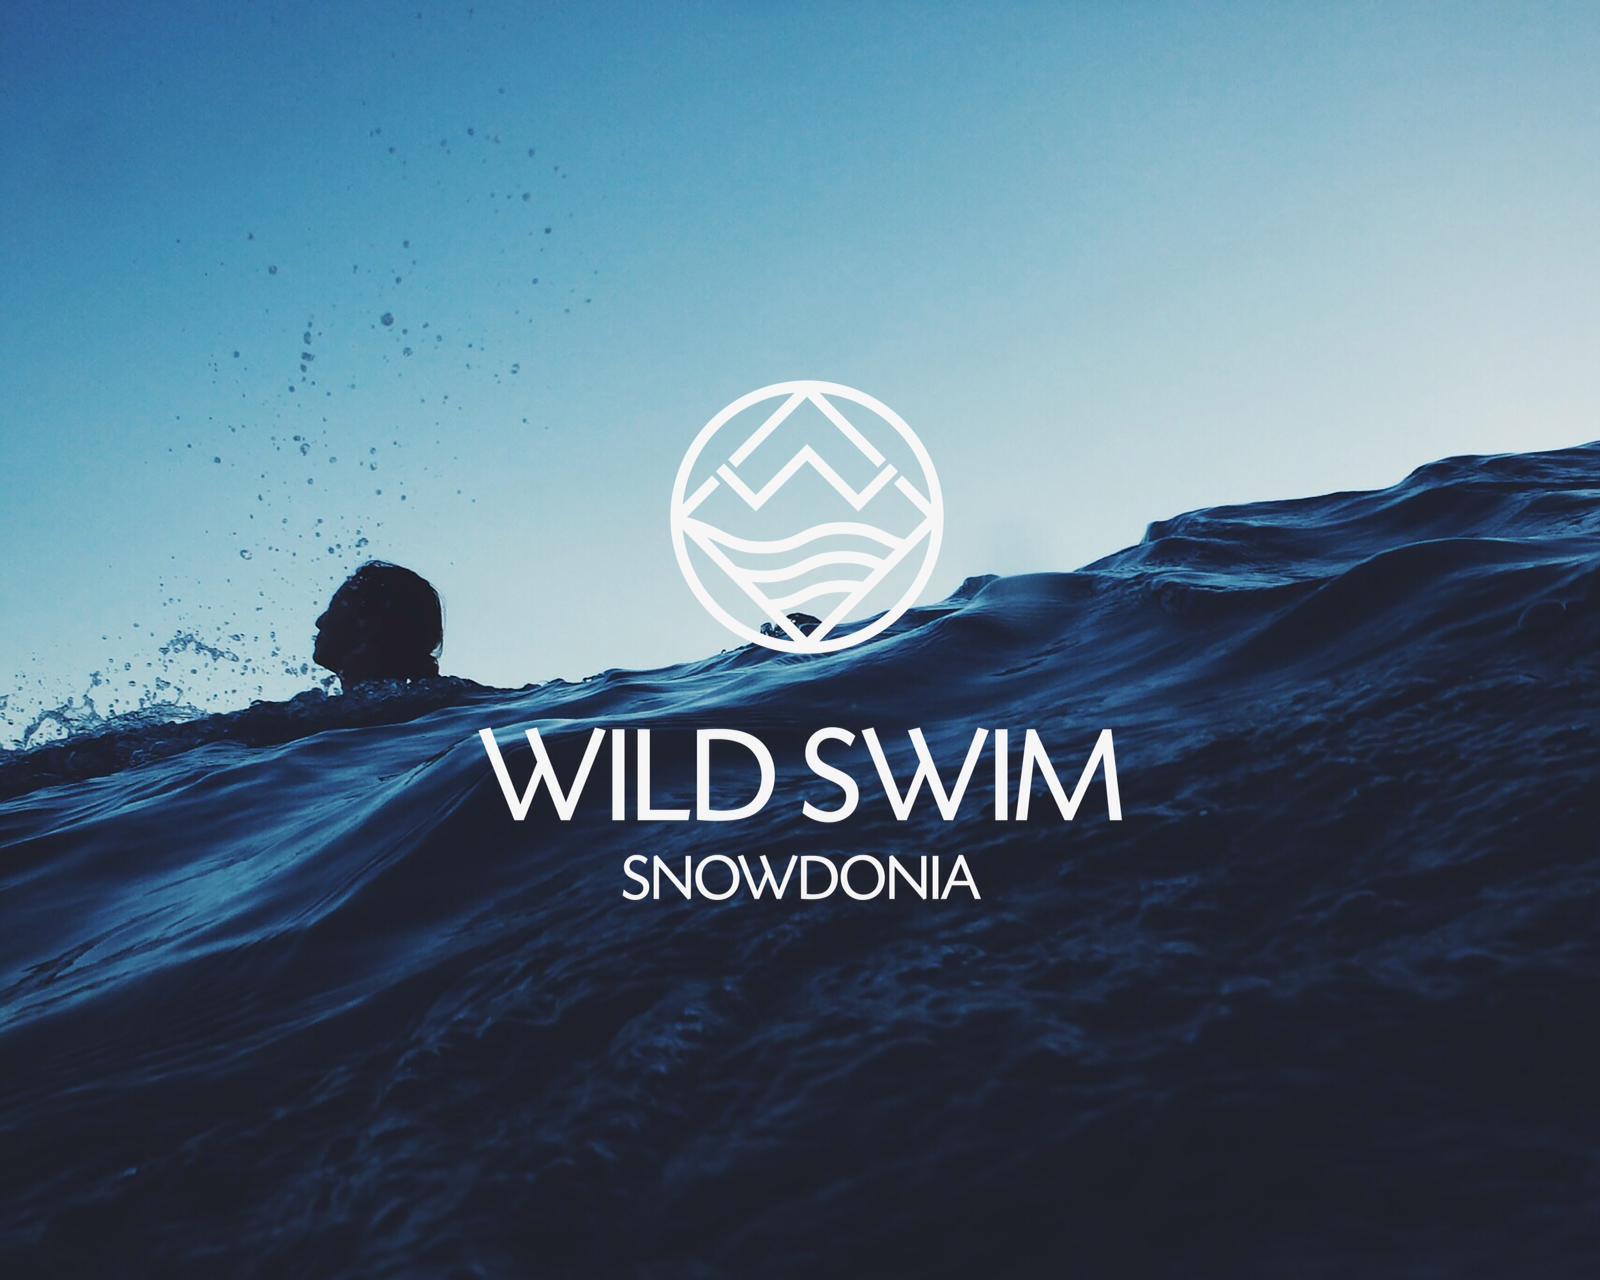 wildswimsnowlogo.JPG